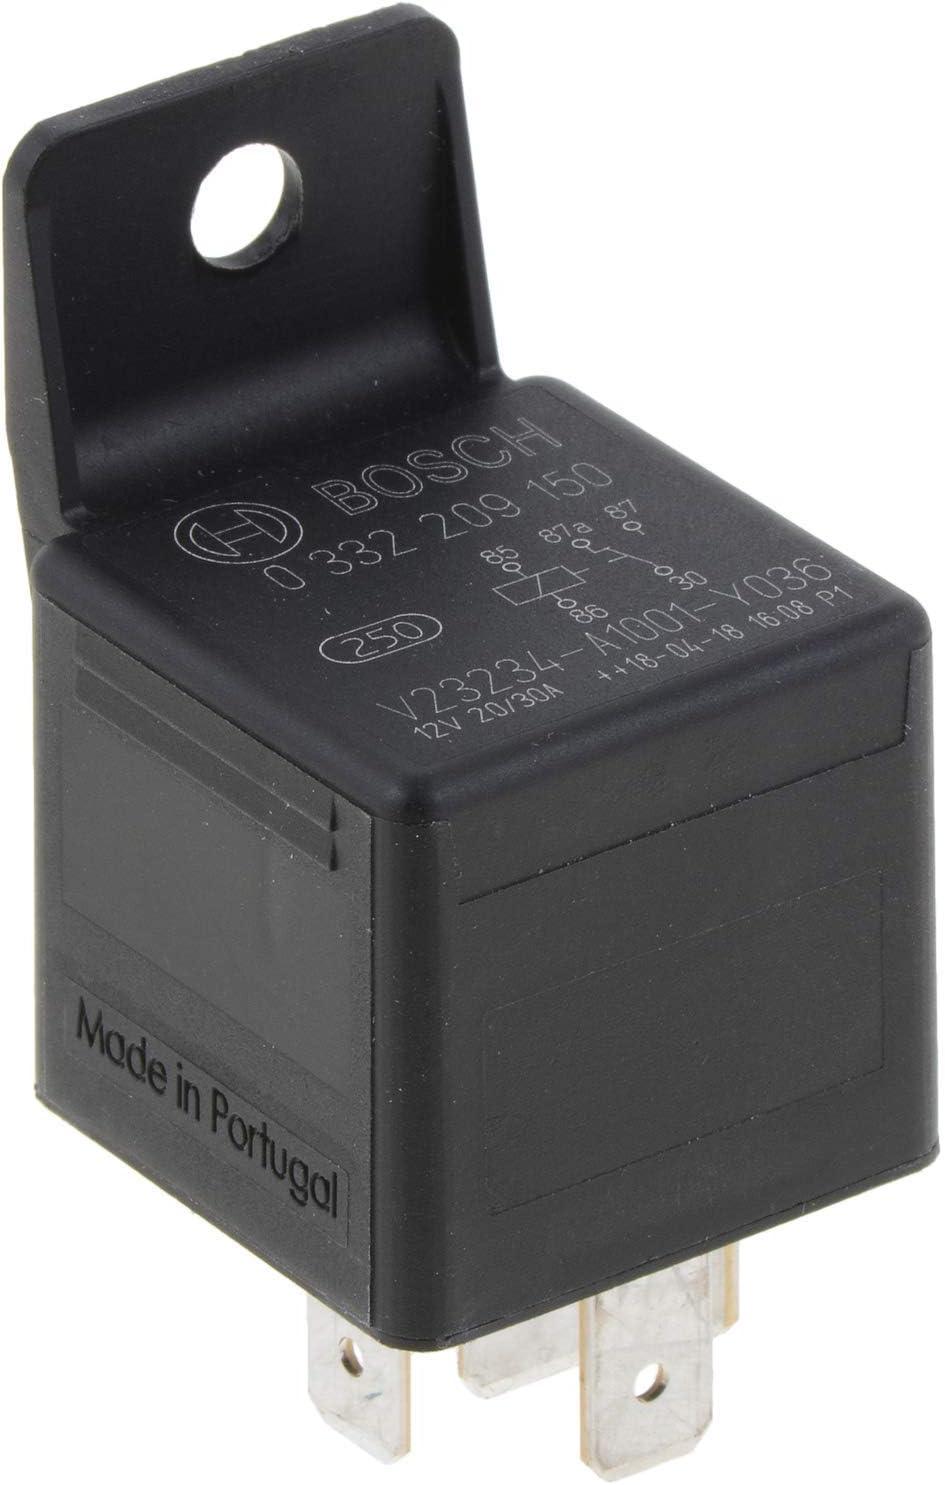 5 Pins, 12 V, 20/30 A, Bosch 0332209150 Changeover Mini Relays: Automotive